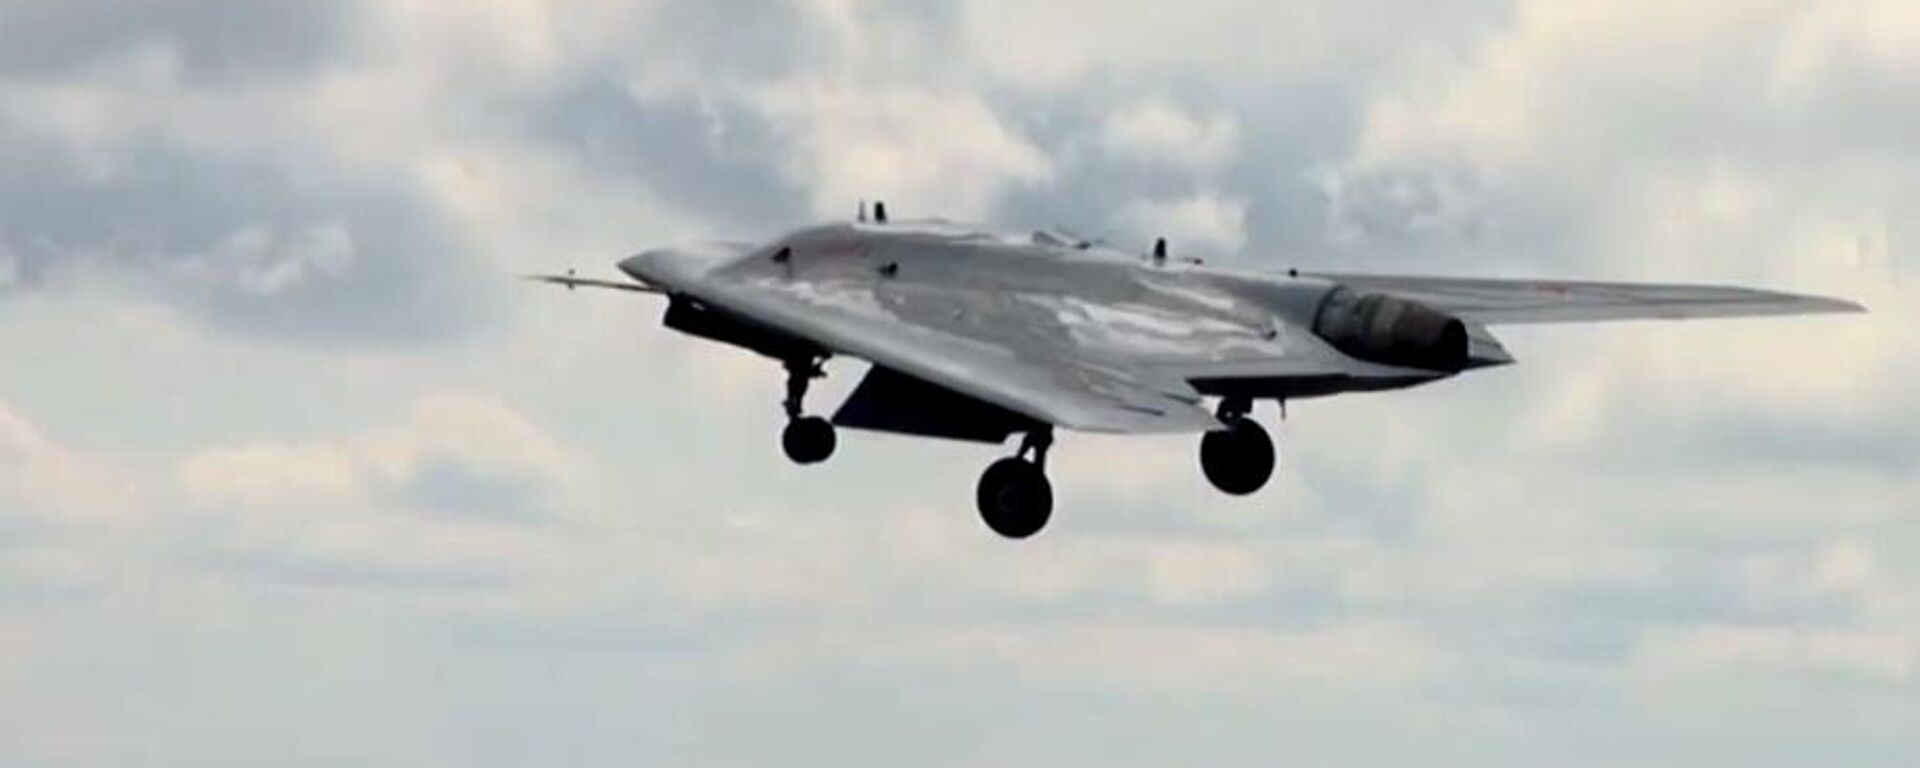 El dron de ataque ruso Ojotnik - Sputnik Mundo, 1920, 28.03.2021